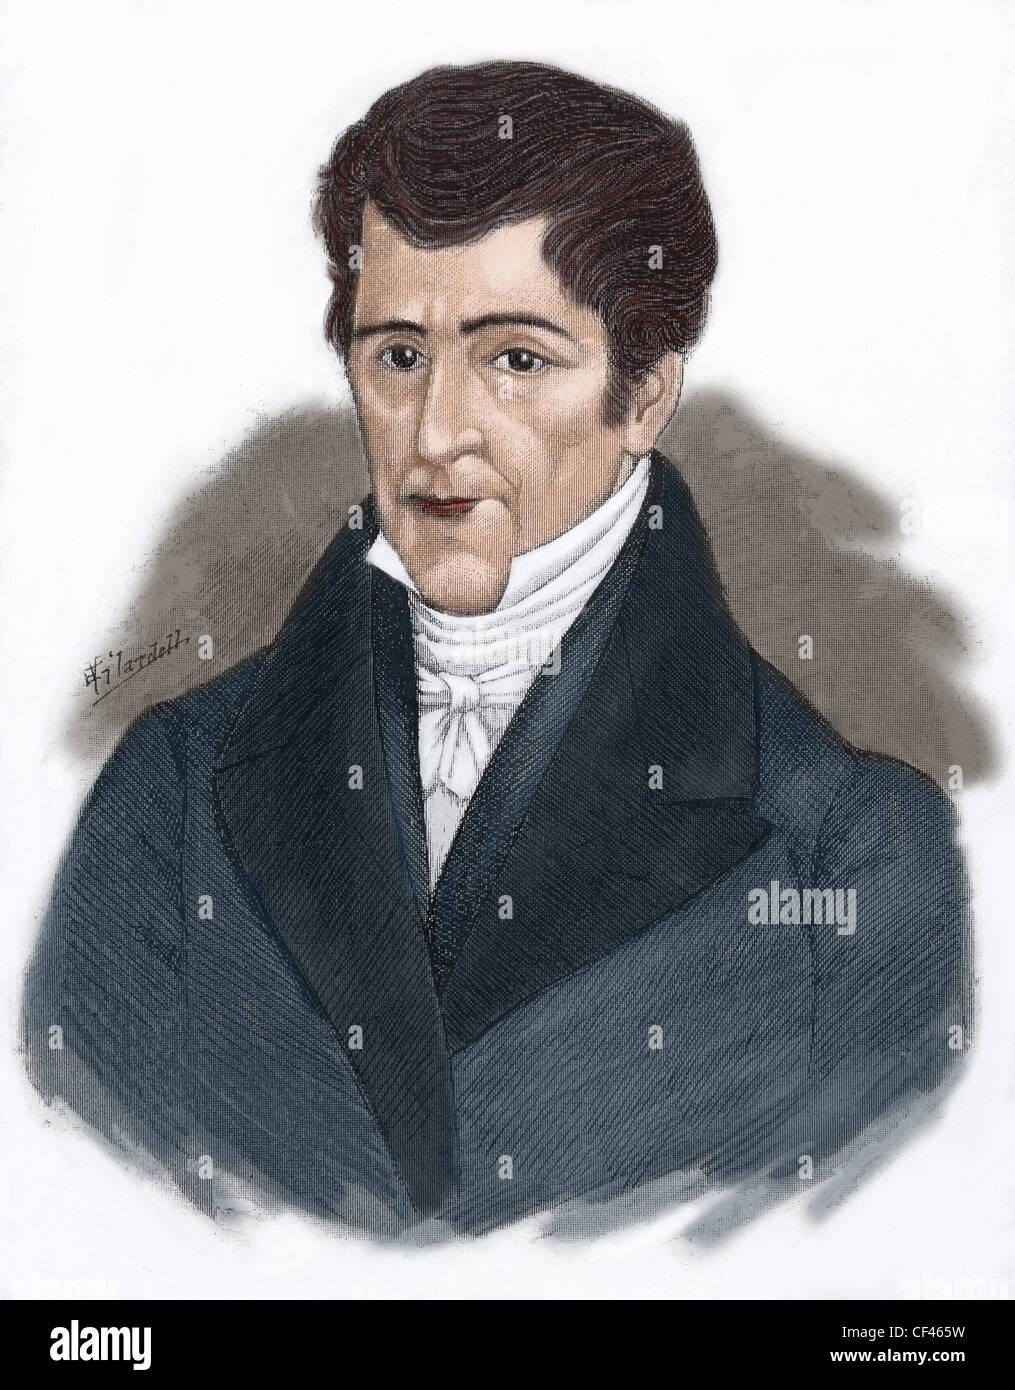 Jose Cecilio del Valle (1780-1834). Honduran politician, writer, philosopher, lawyer, and journalist. Portrait. - Stock Image